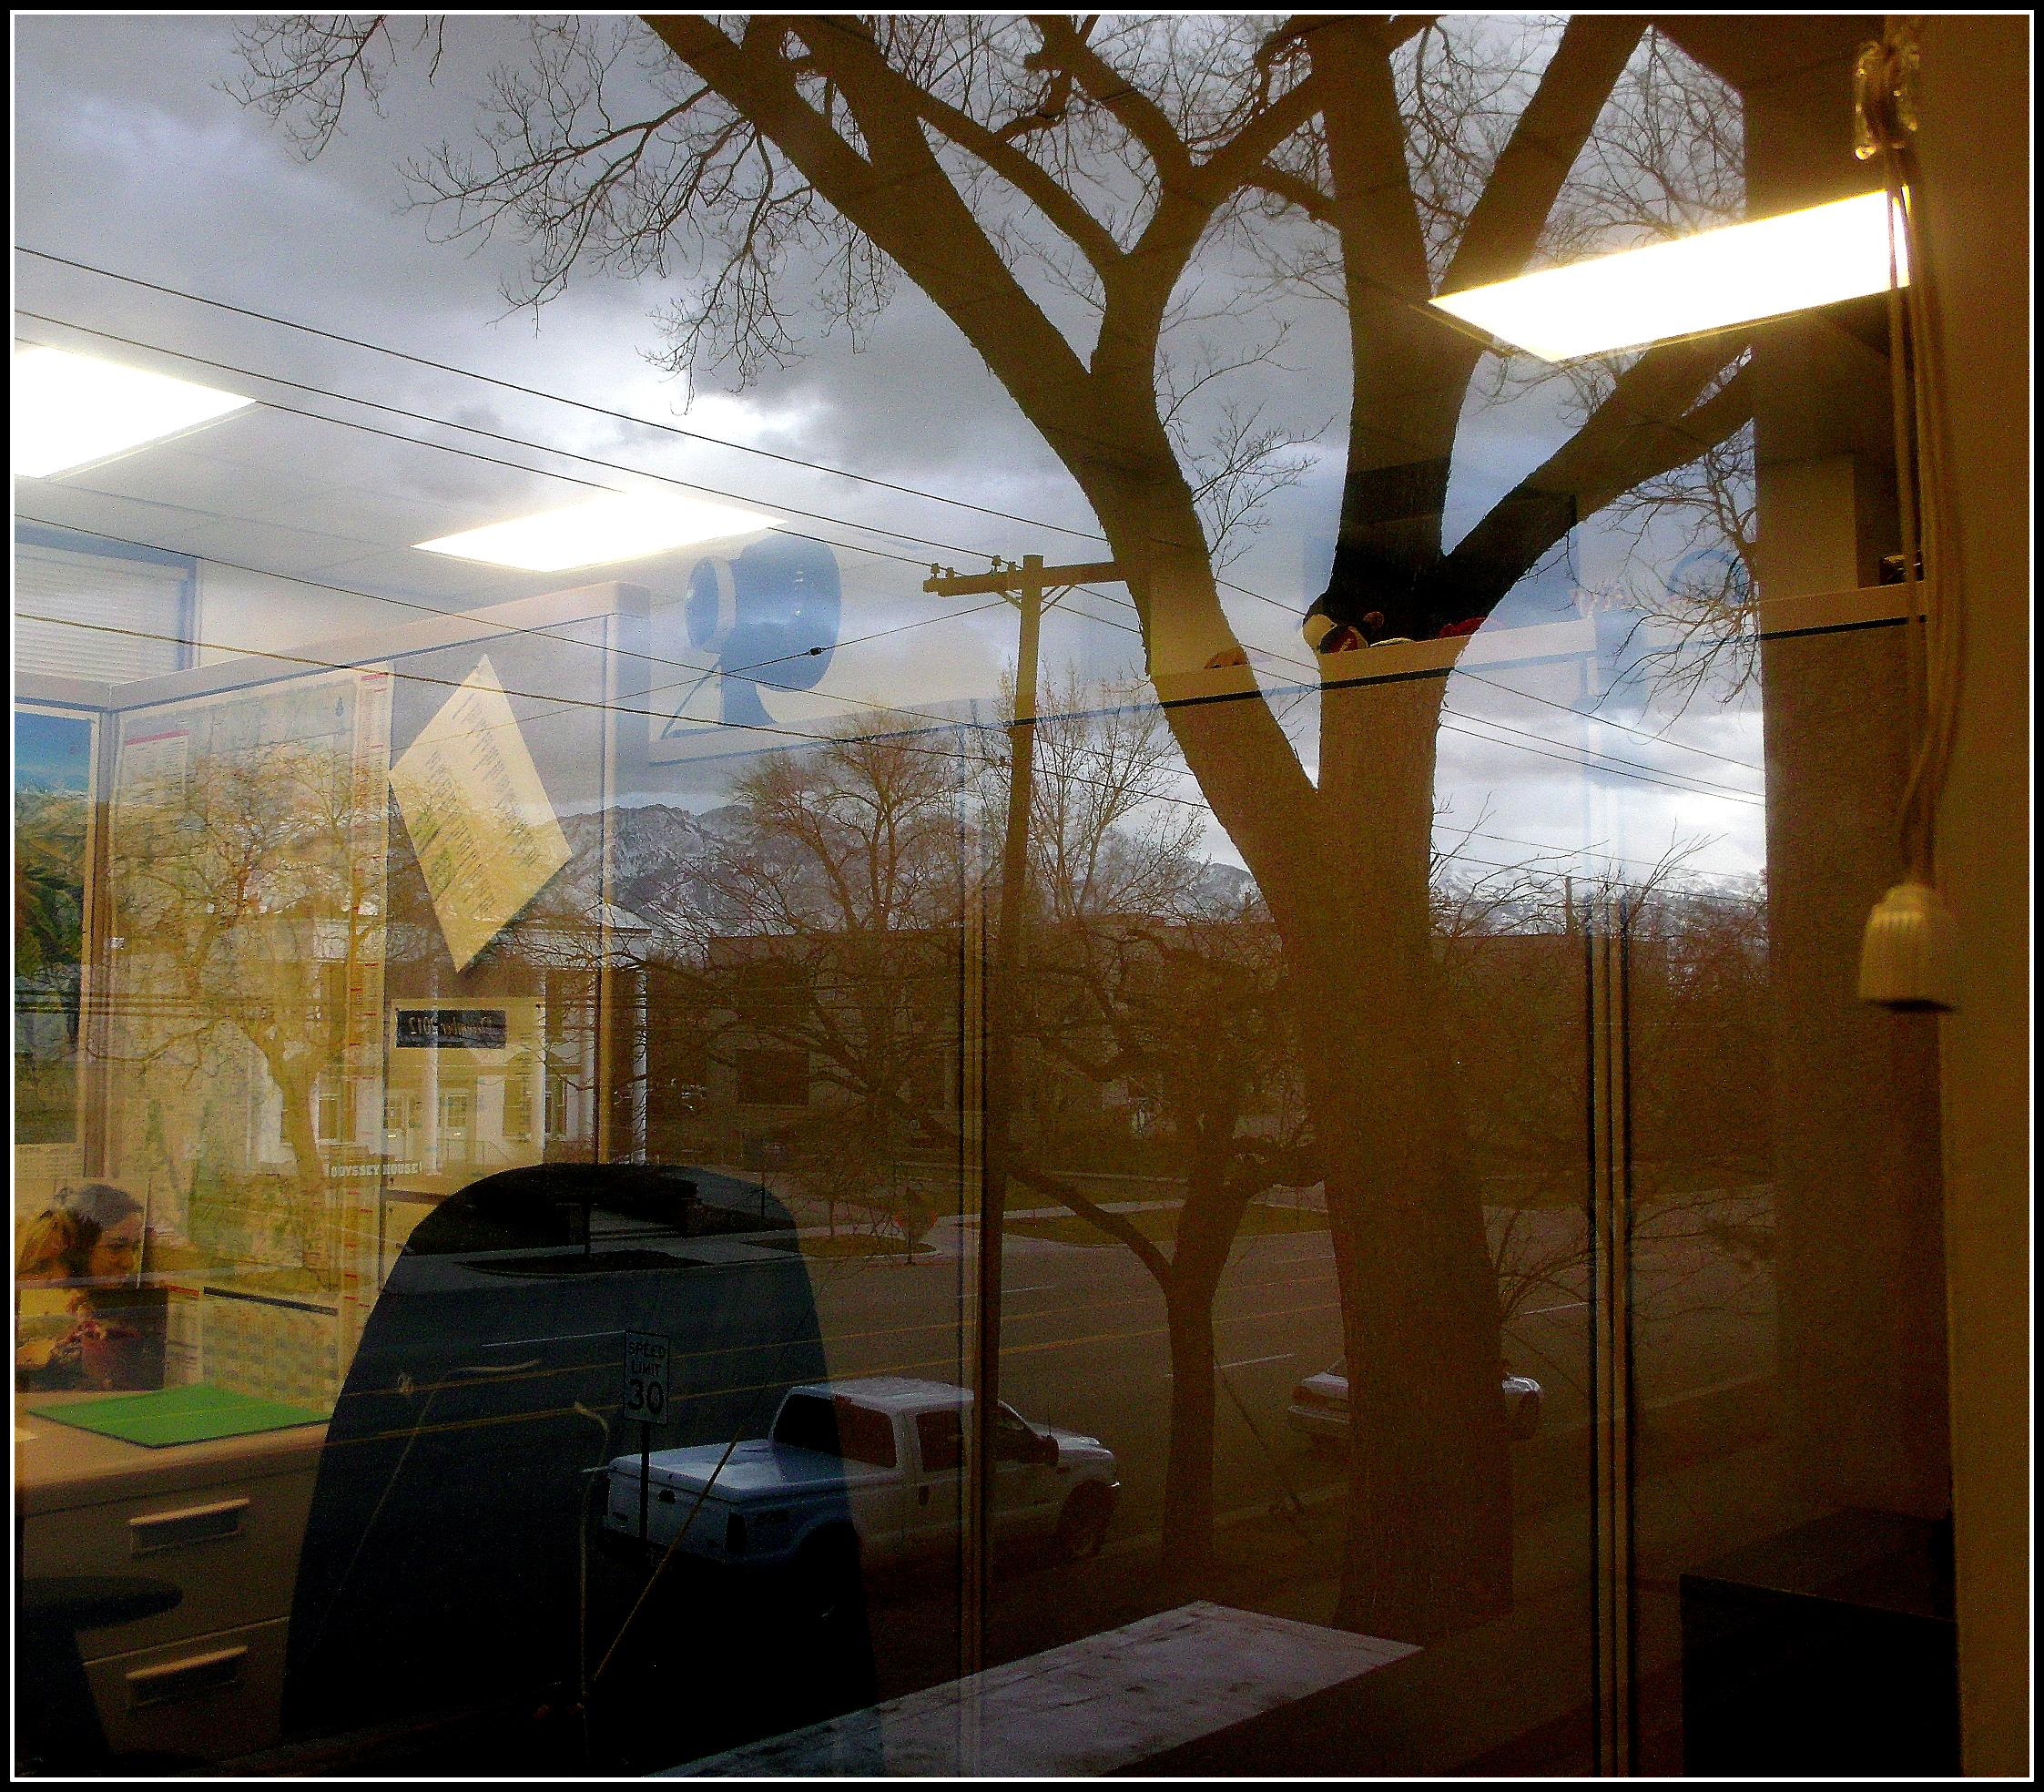 Work window reflection